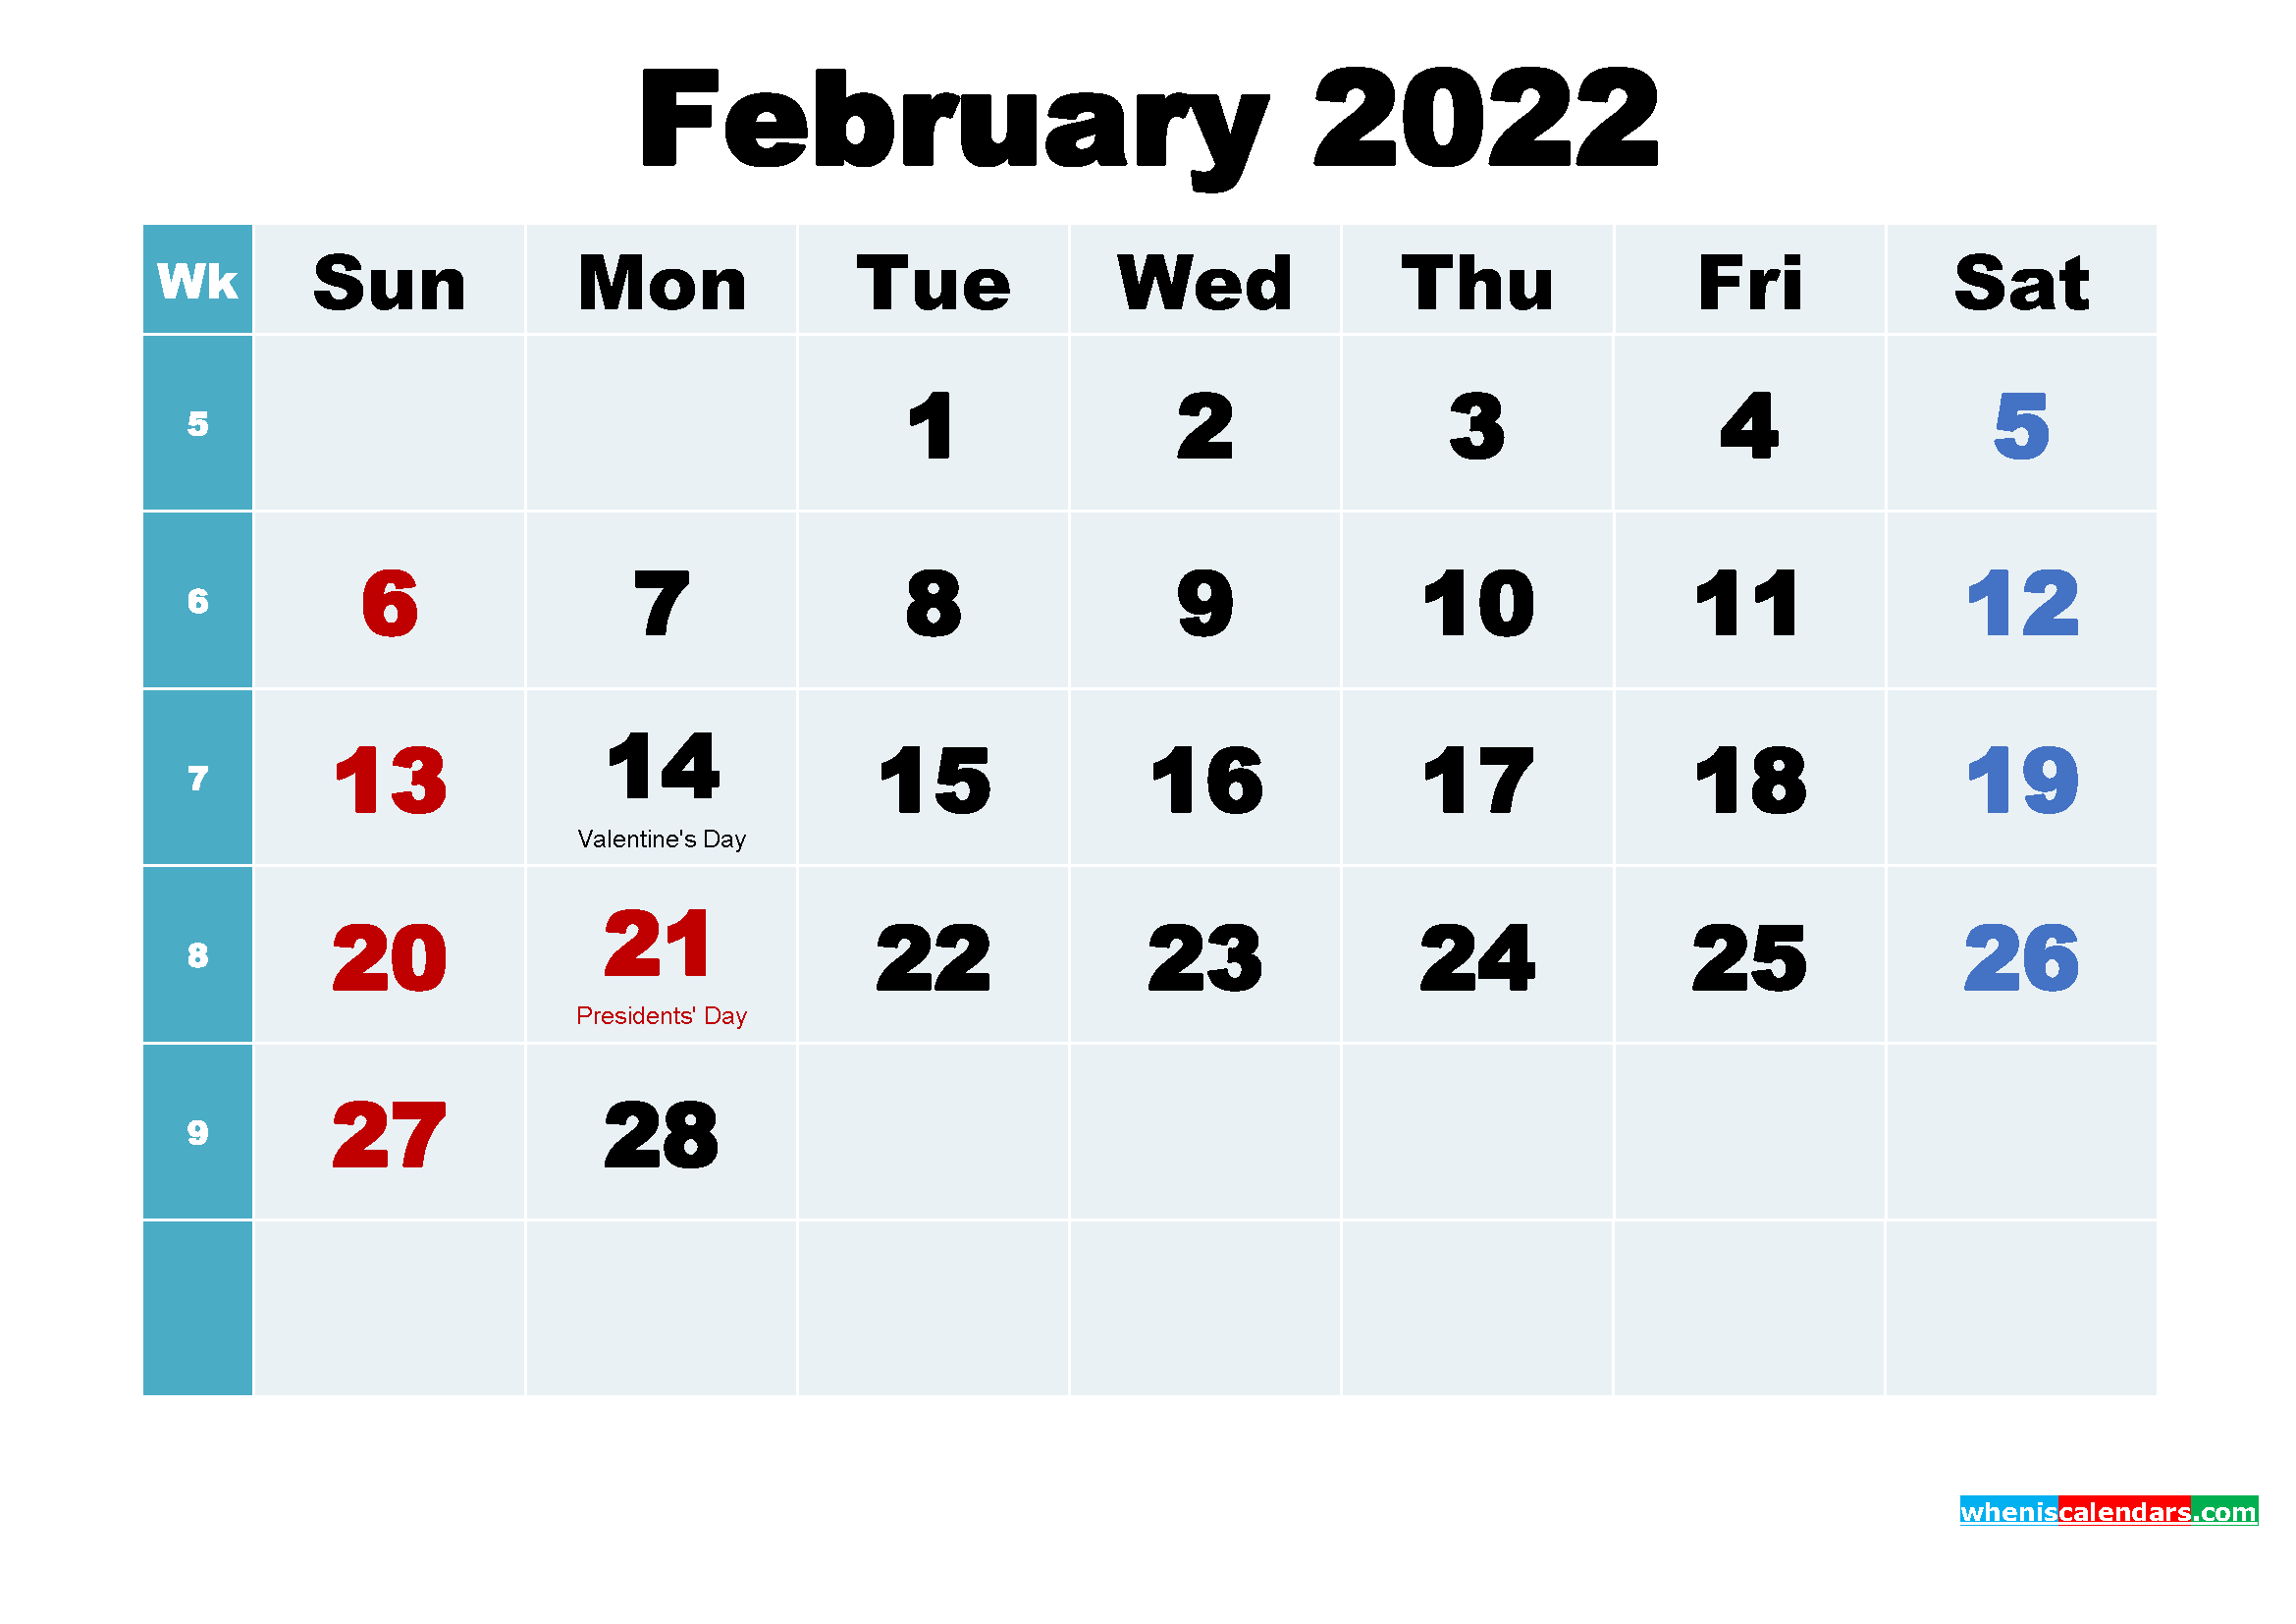 Free Desktop Calendar 2022.Free Printable February 2022 Calendar Wallpaper 2339x1654 Download Hd Wallpaper Wallpapertip